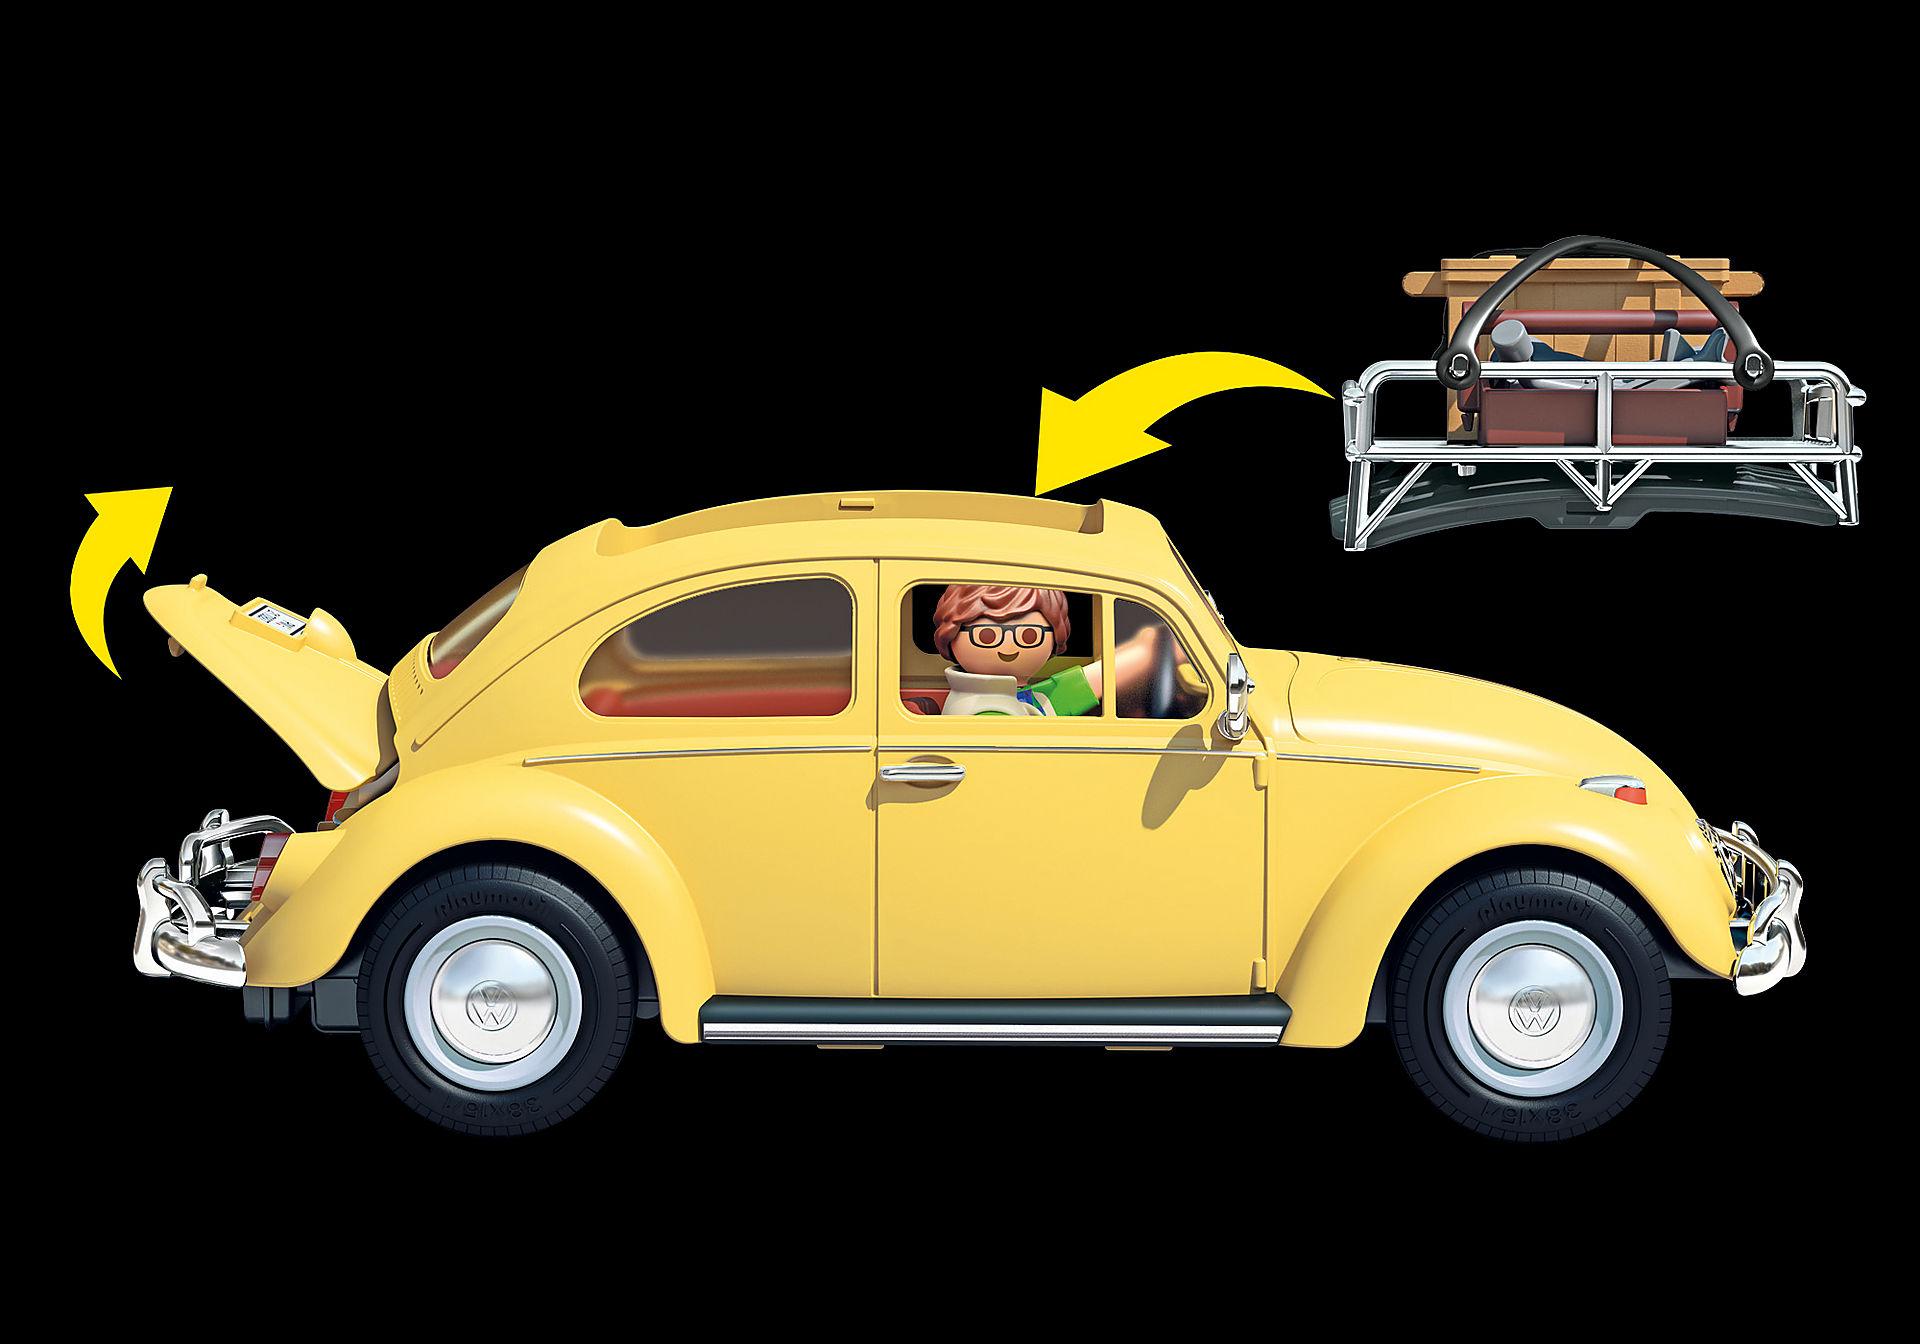 70827 Volkswagen Σκαραβαίος - Special Edition zoom image5